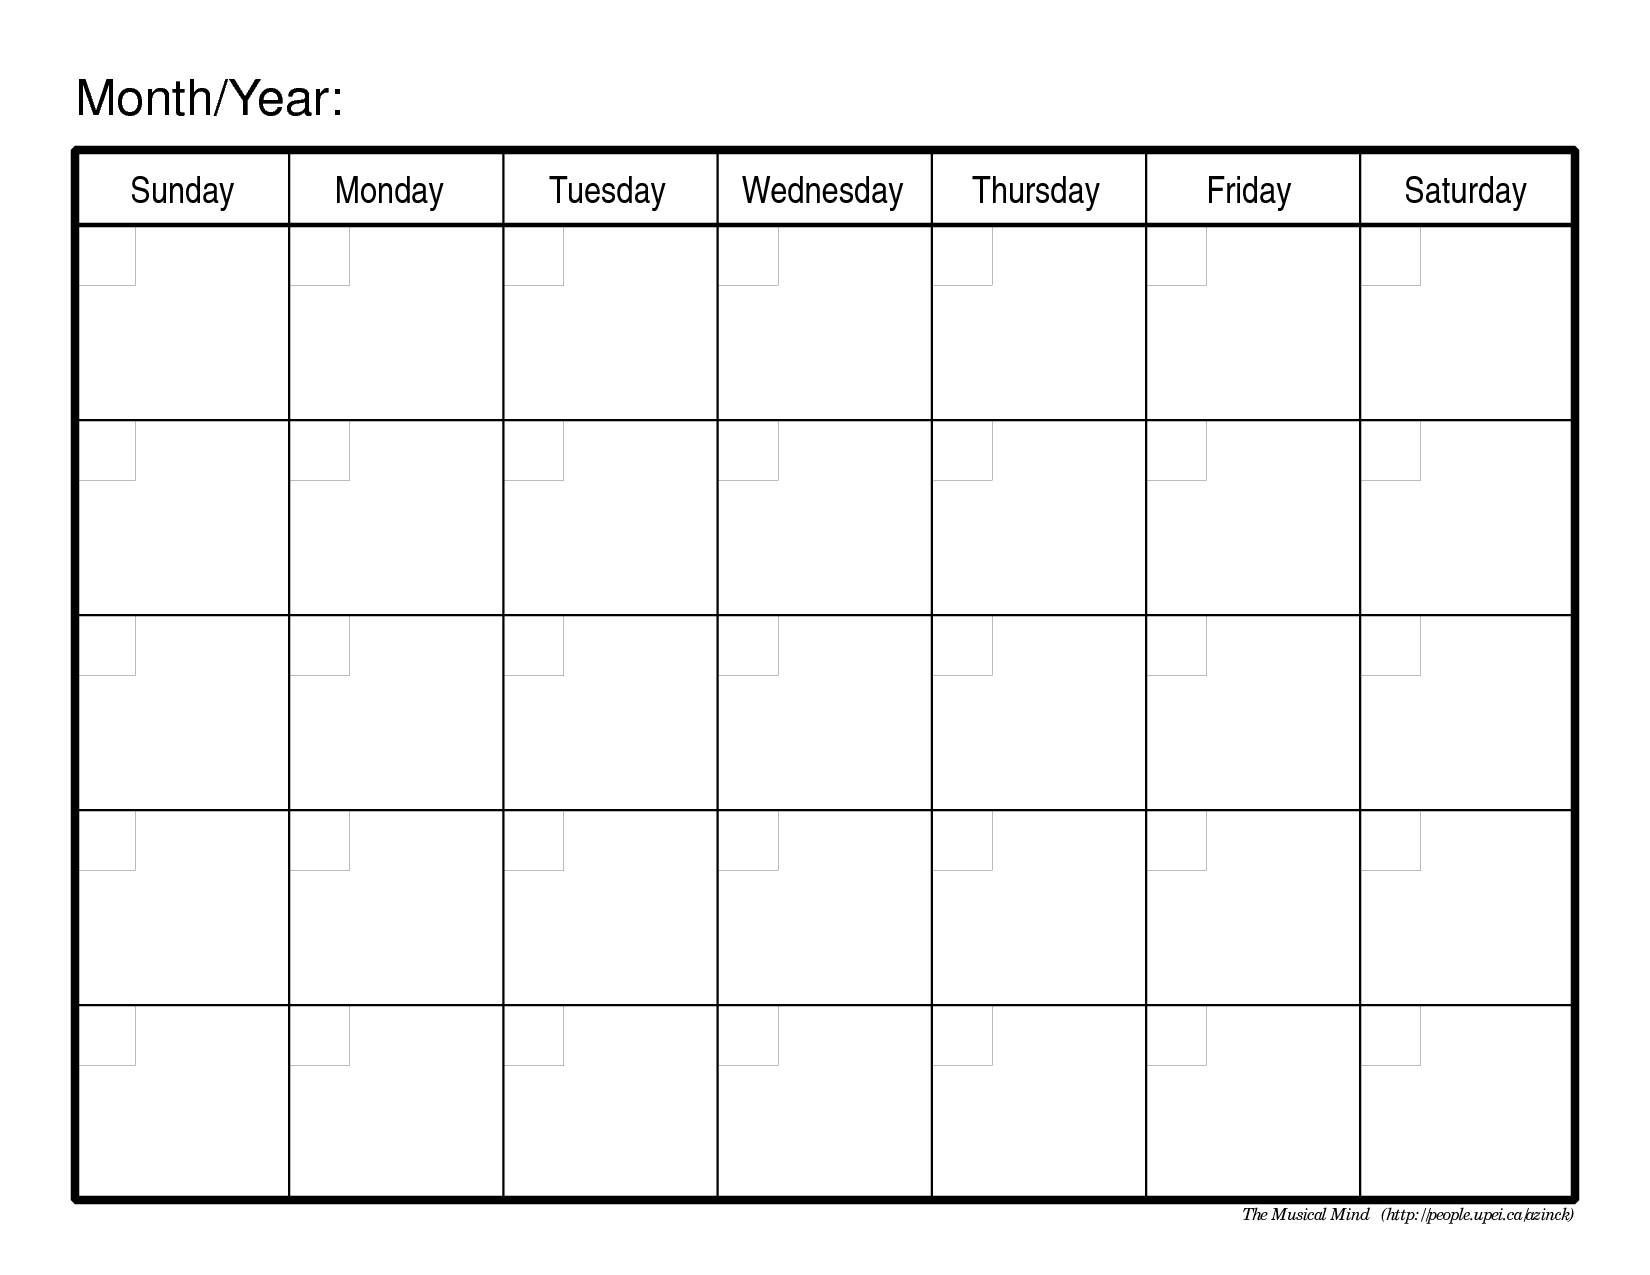 Monthly Calendar Free Printable   Printable Calendar 2014  Free Printable And Editable Weekly Calendar